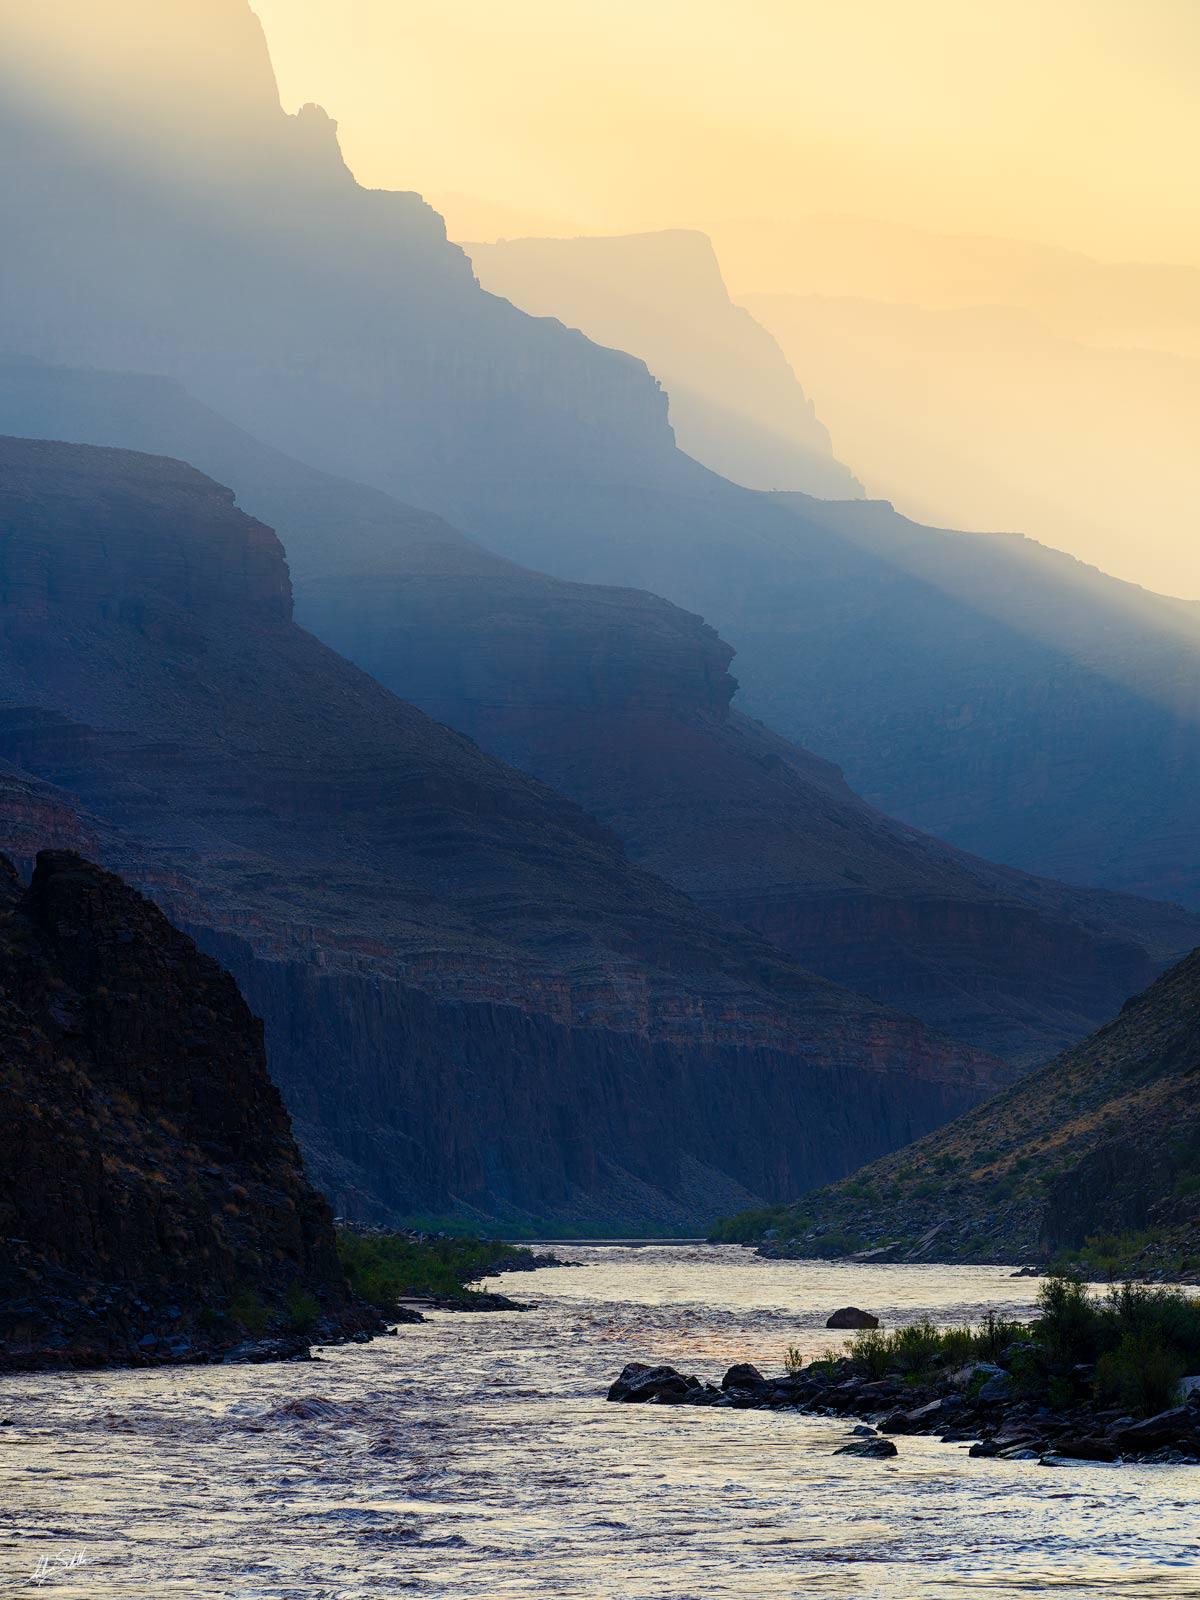 AZ, Arizona, Below the Rim, Colorado River, Expedition, Fire, FujiFilm, GFX, GFX 100, Grand Canyon, National Park, Owl Eyes Camp, Powell Plateau, River Trip, Smoke, forest fire, wildfire, photo